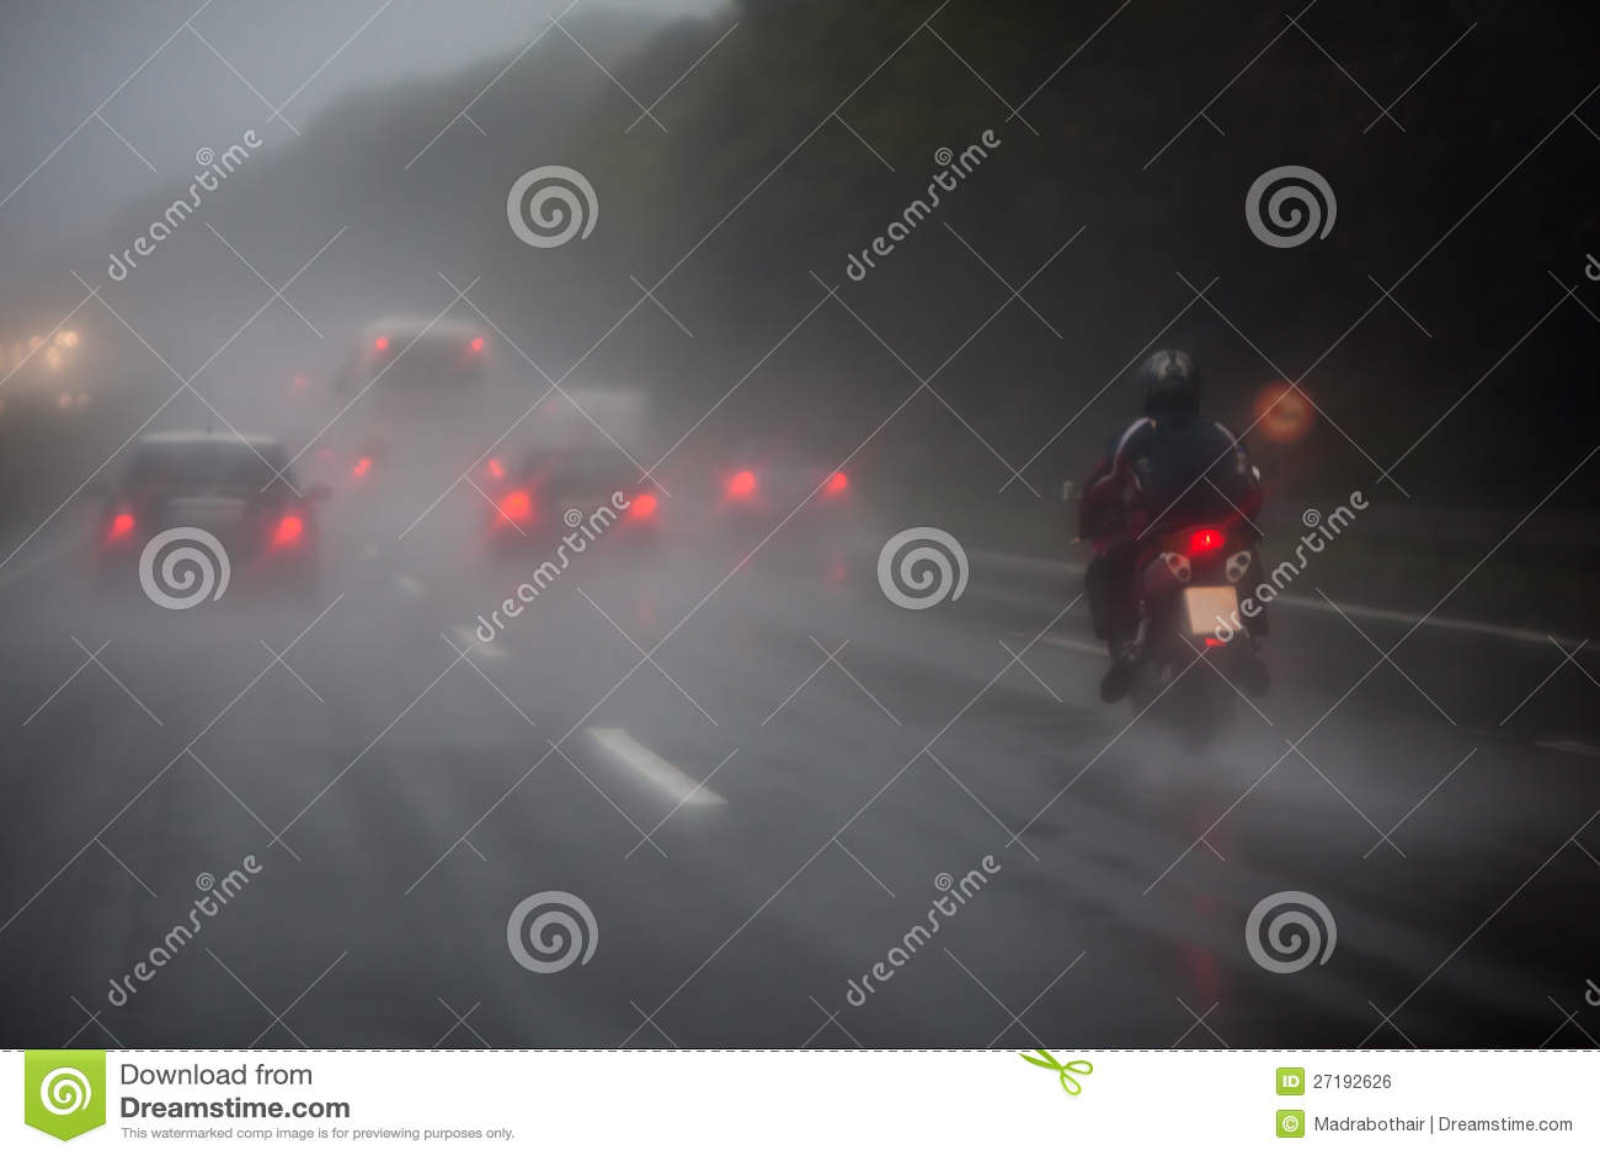 Traffic on the autobahn with heavy rain